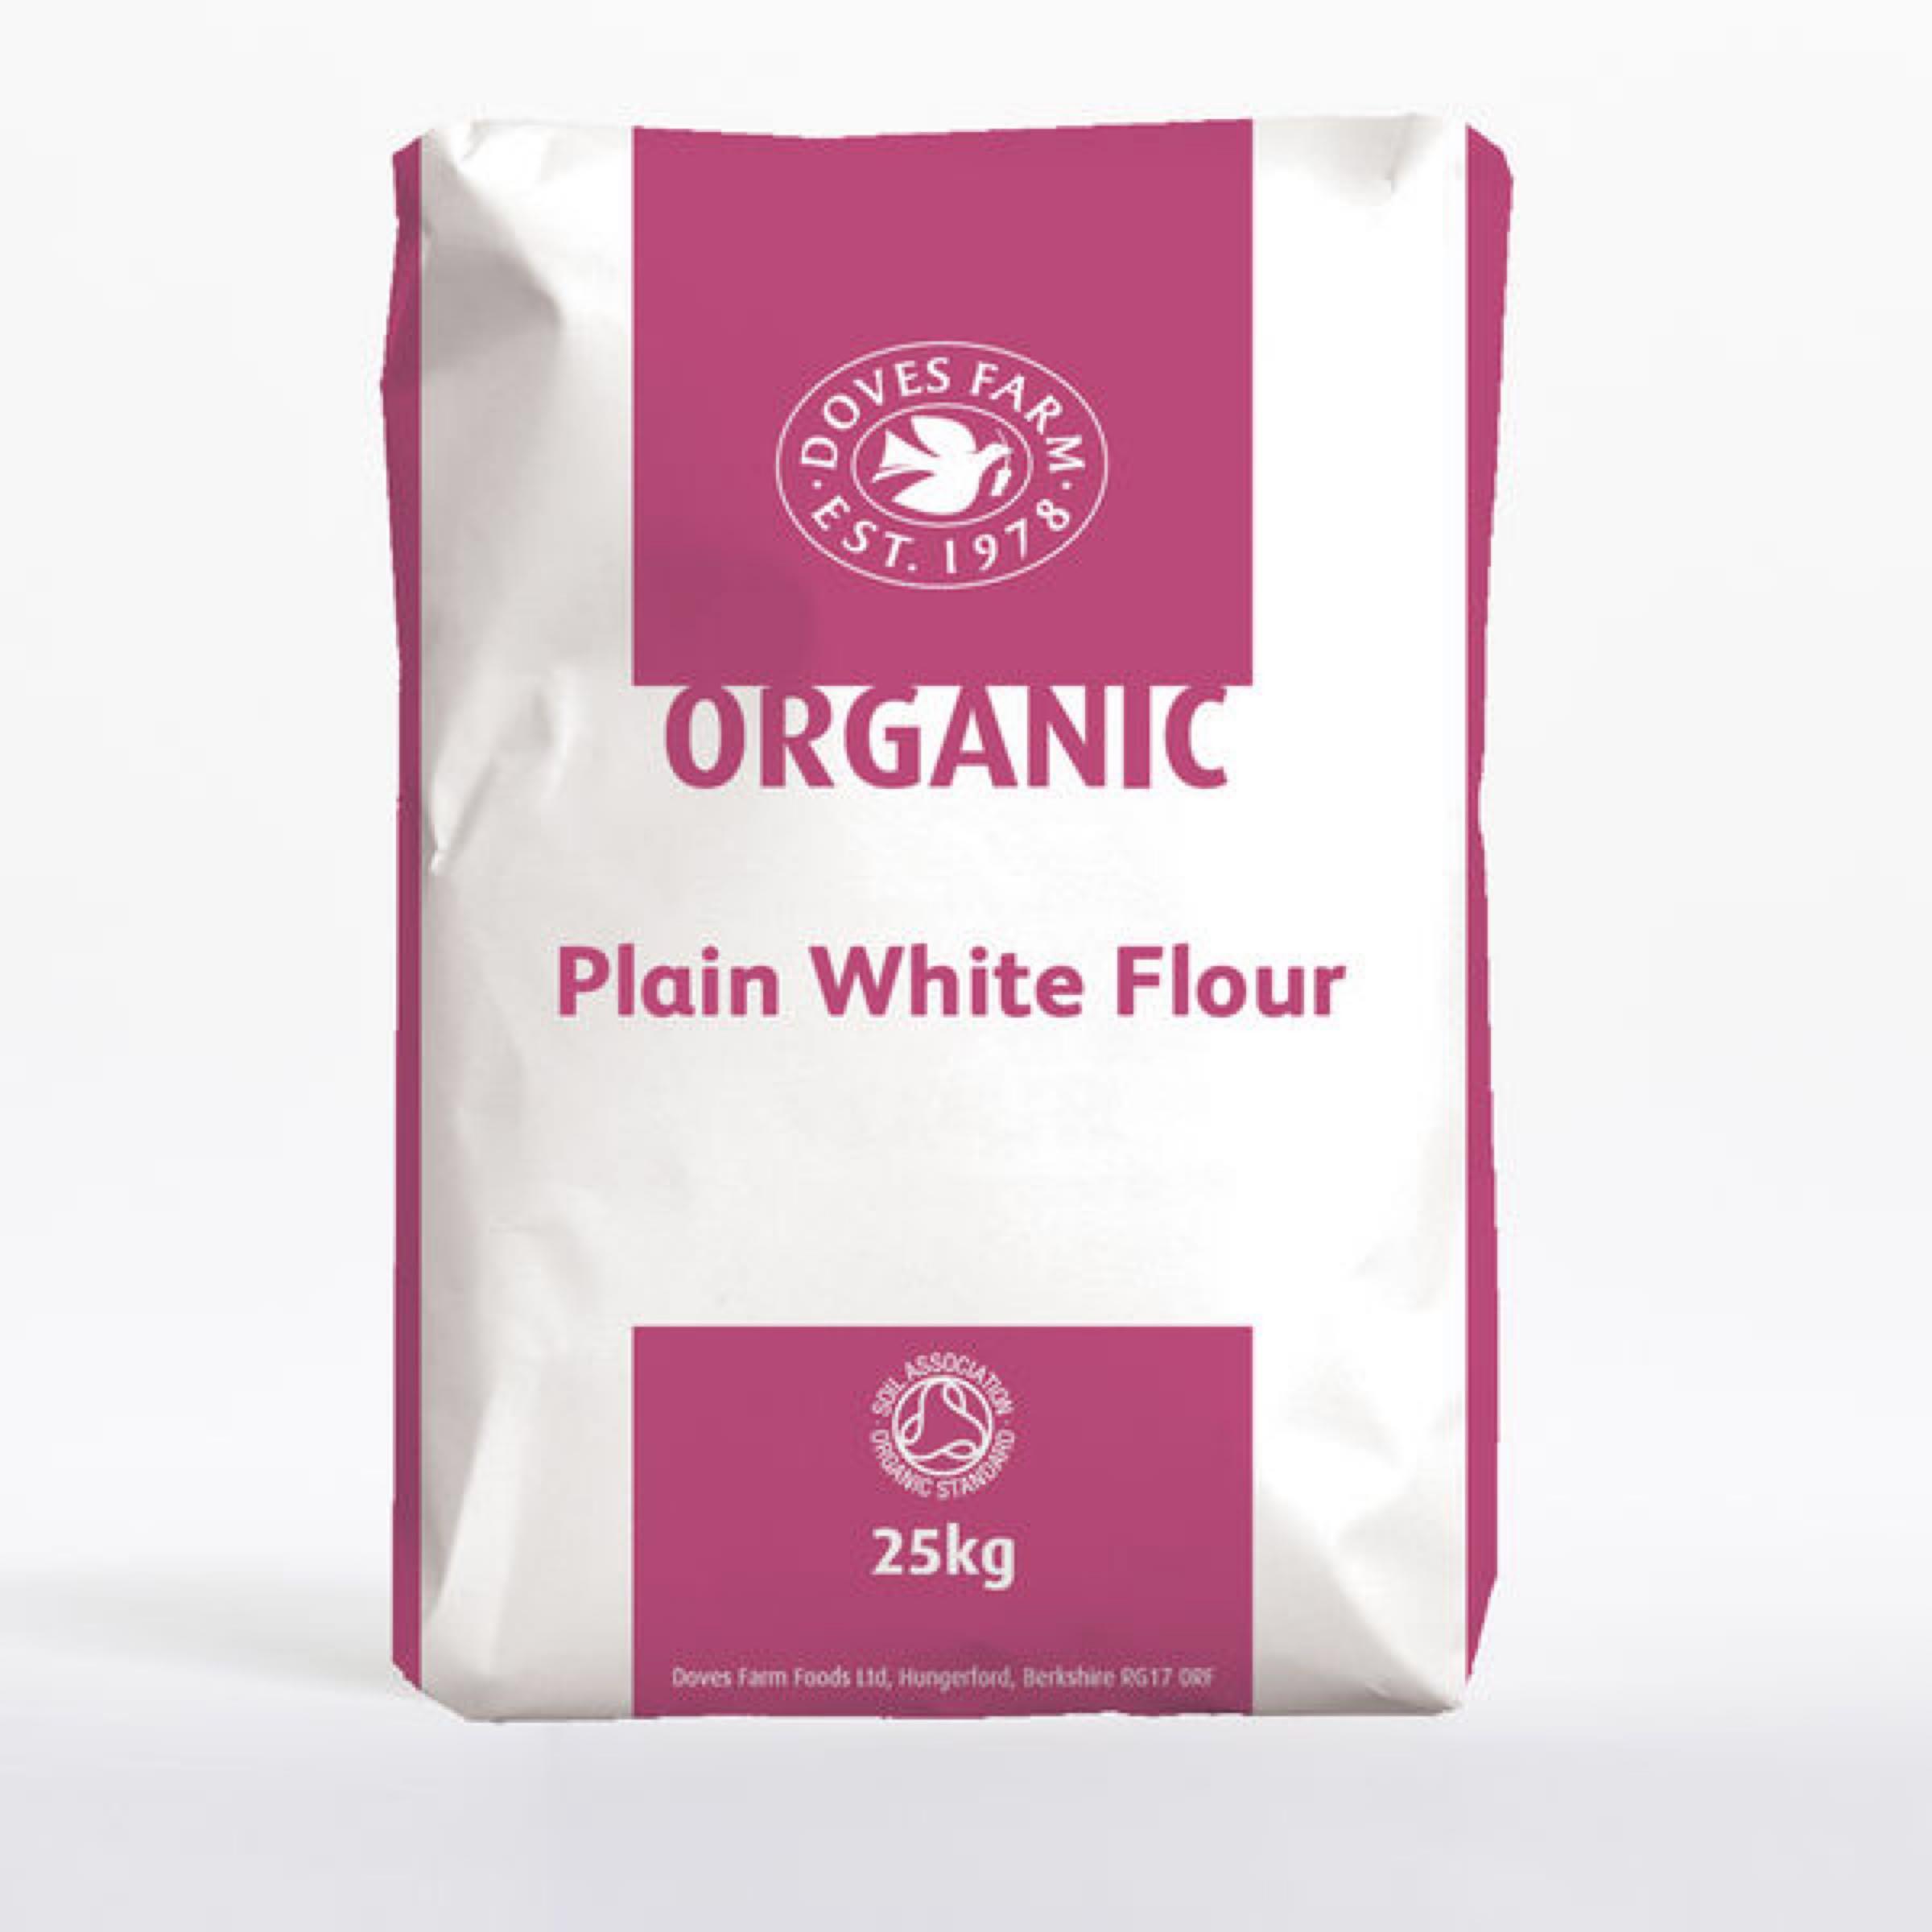 Plain White Flour (doves, organic)